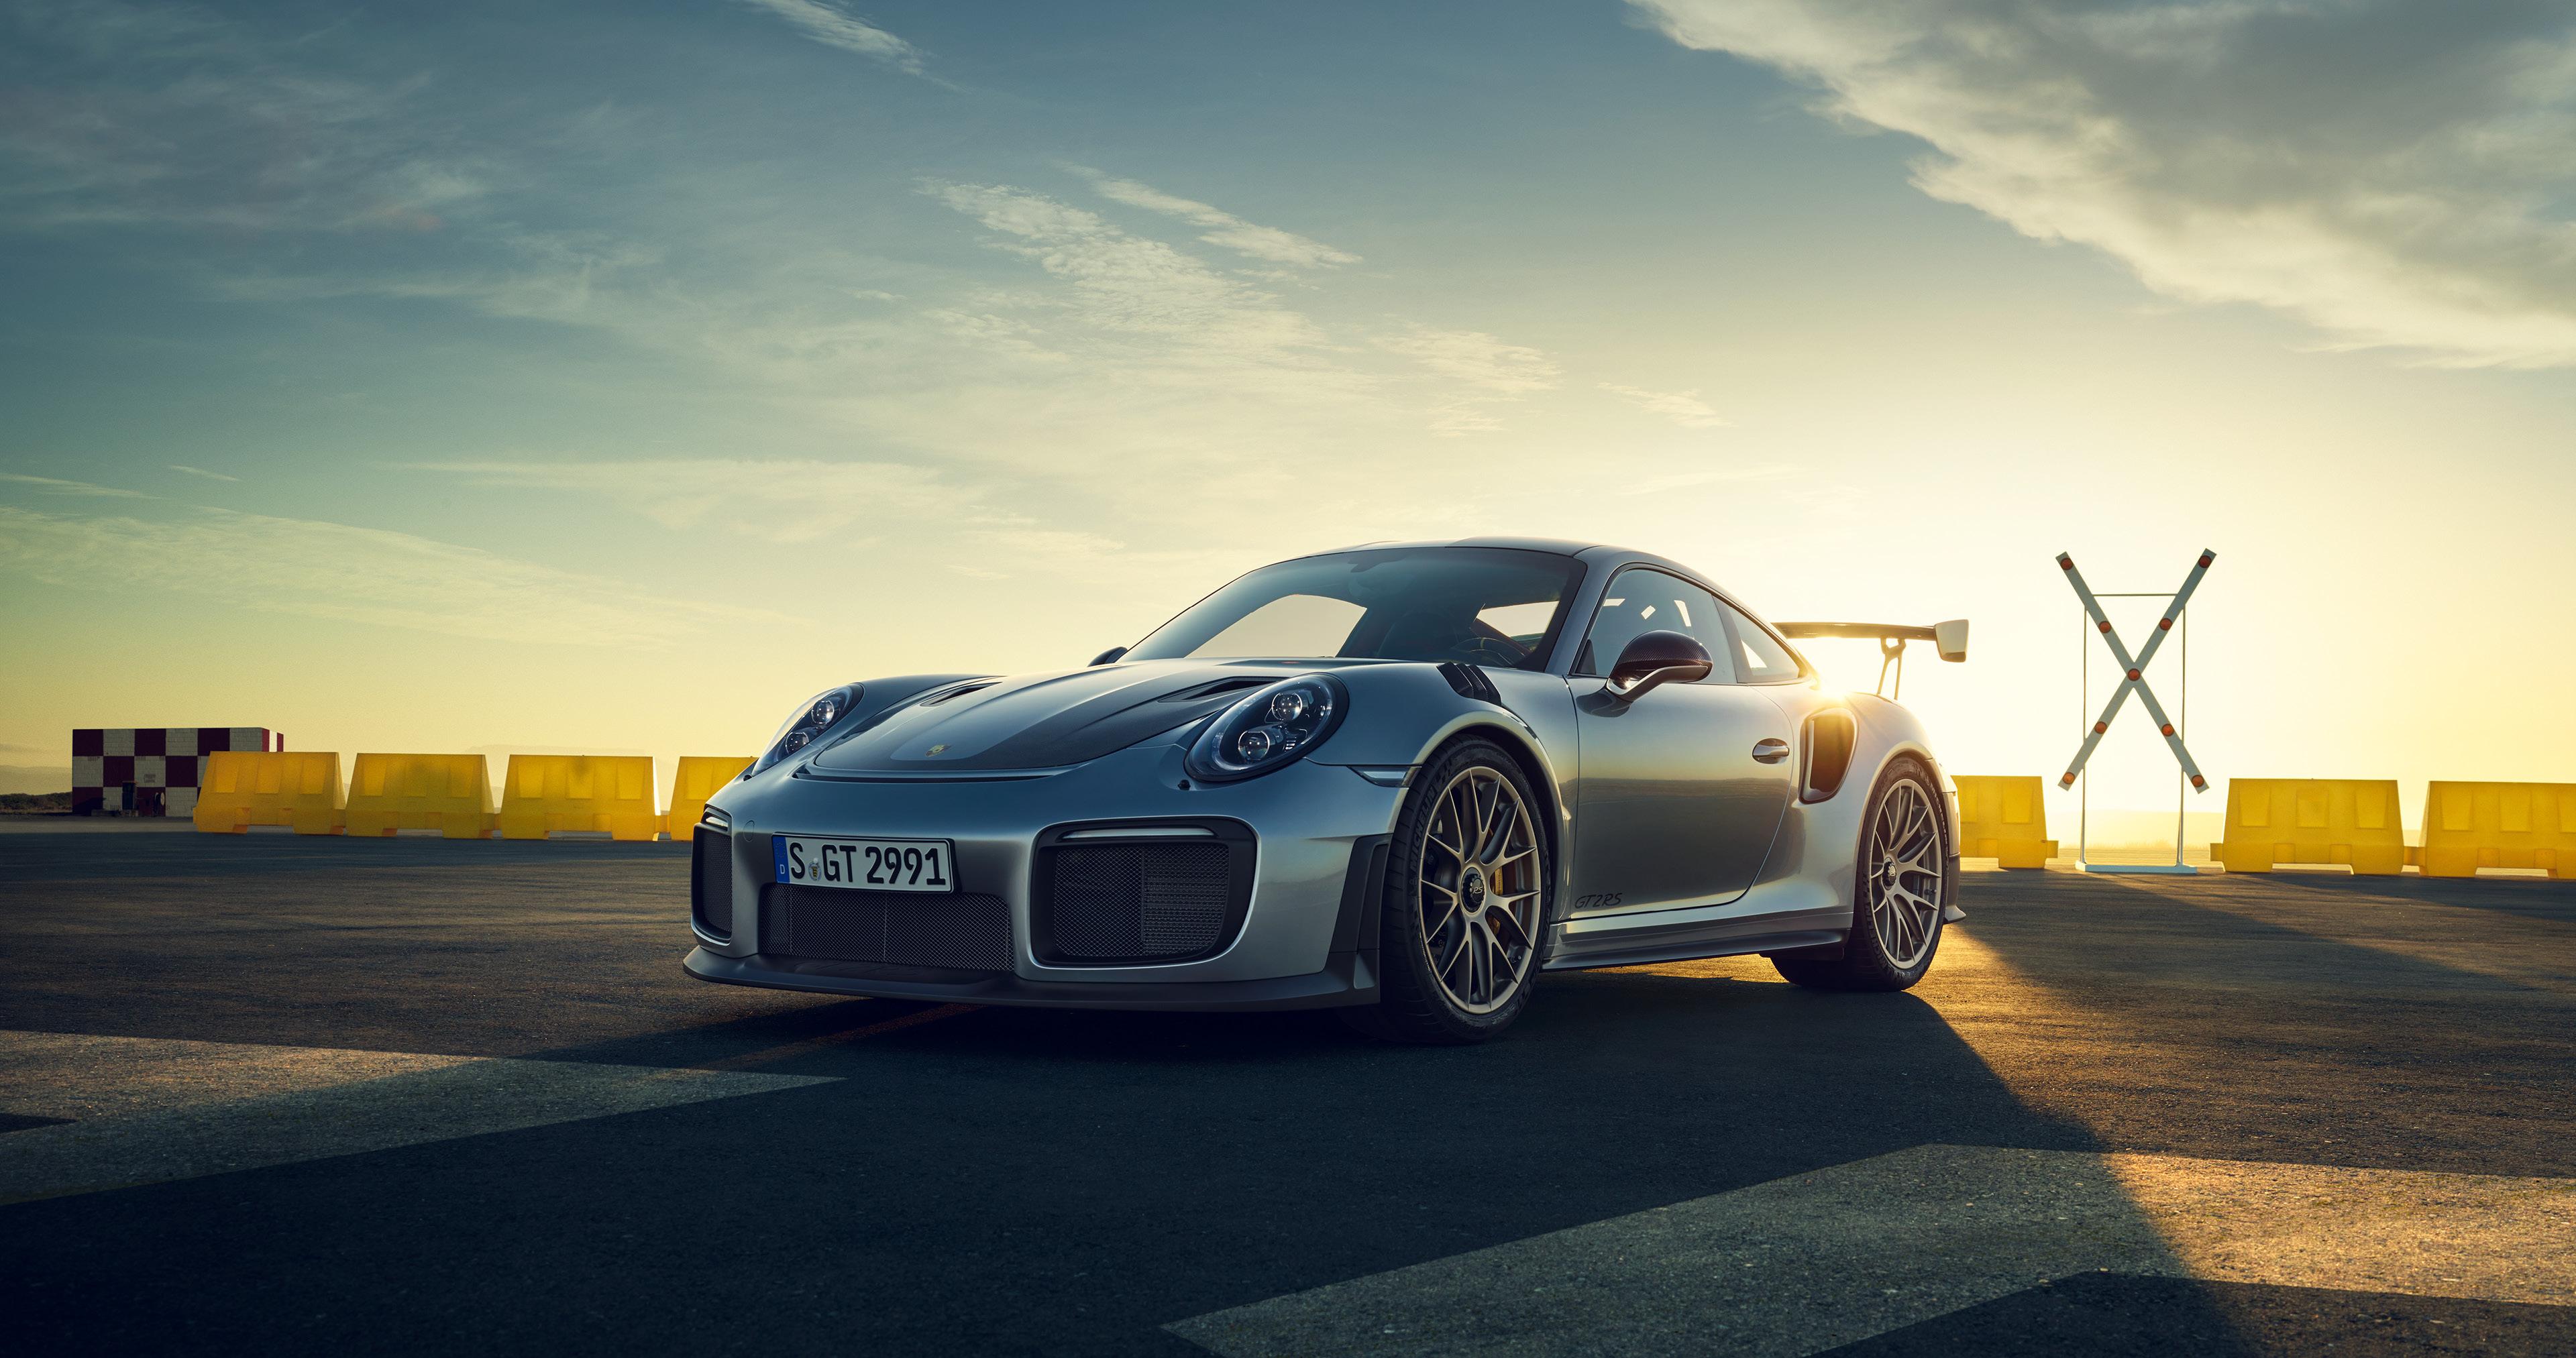 Porsche 911 GT2 RS 4k, HD Cars, 4k Wallpapers, Images ...